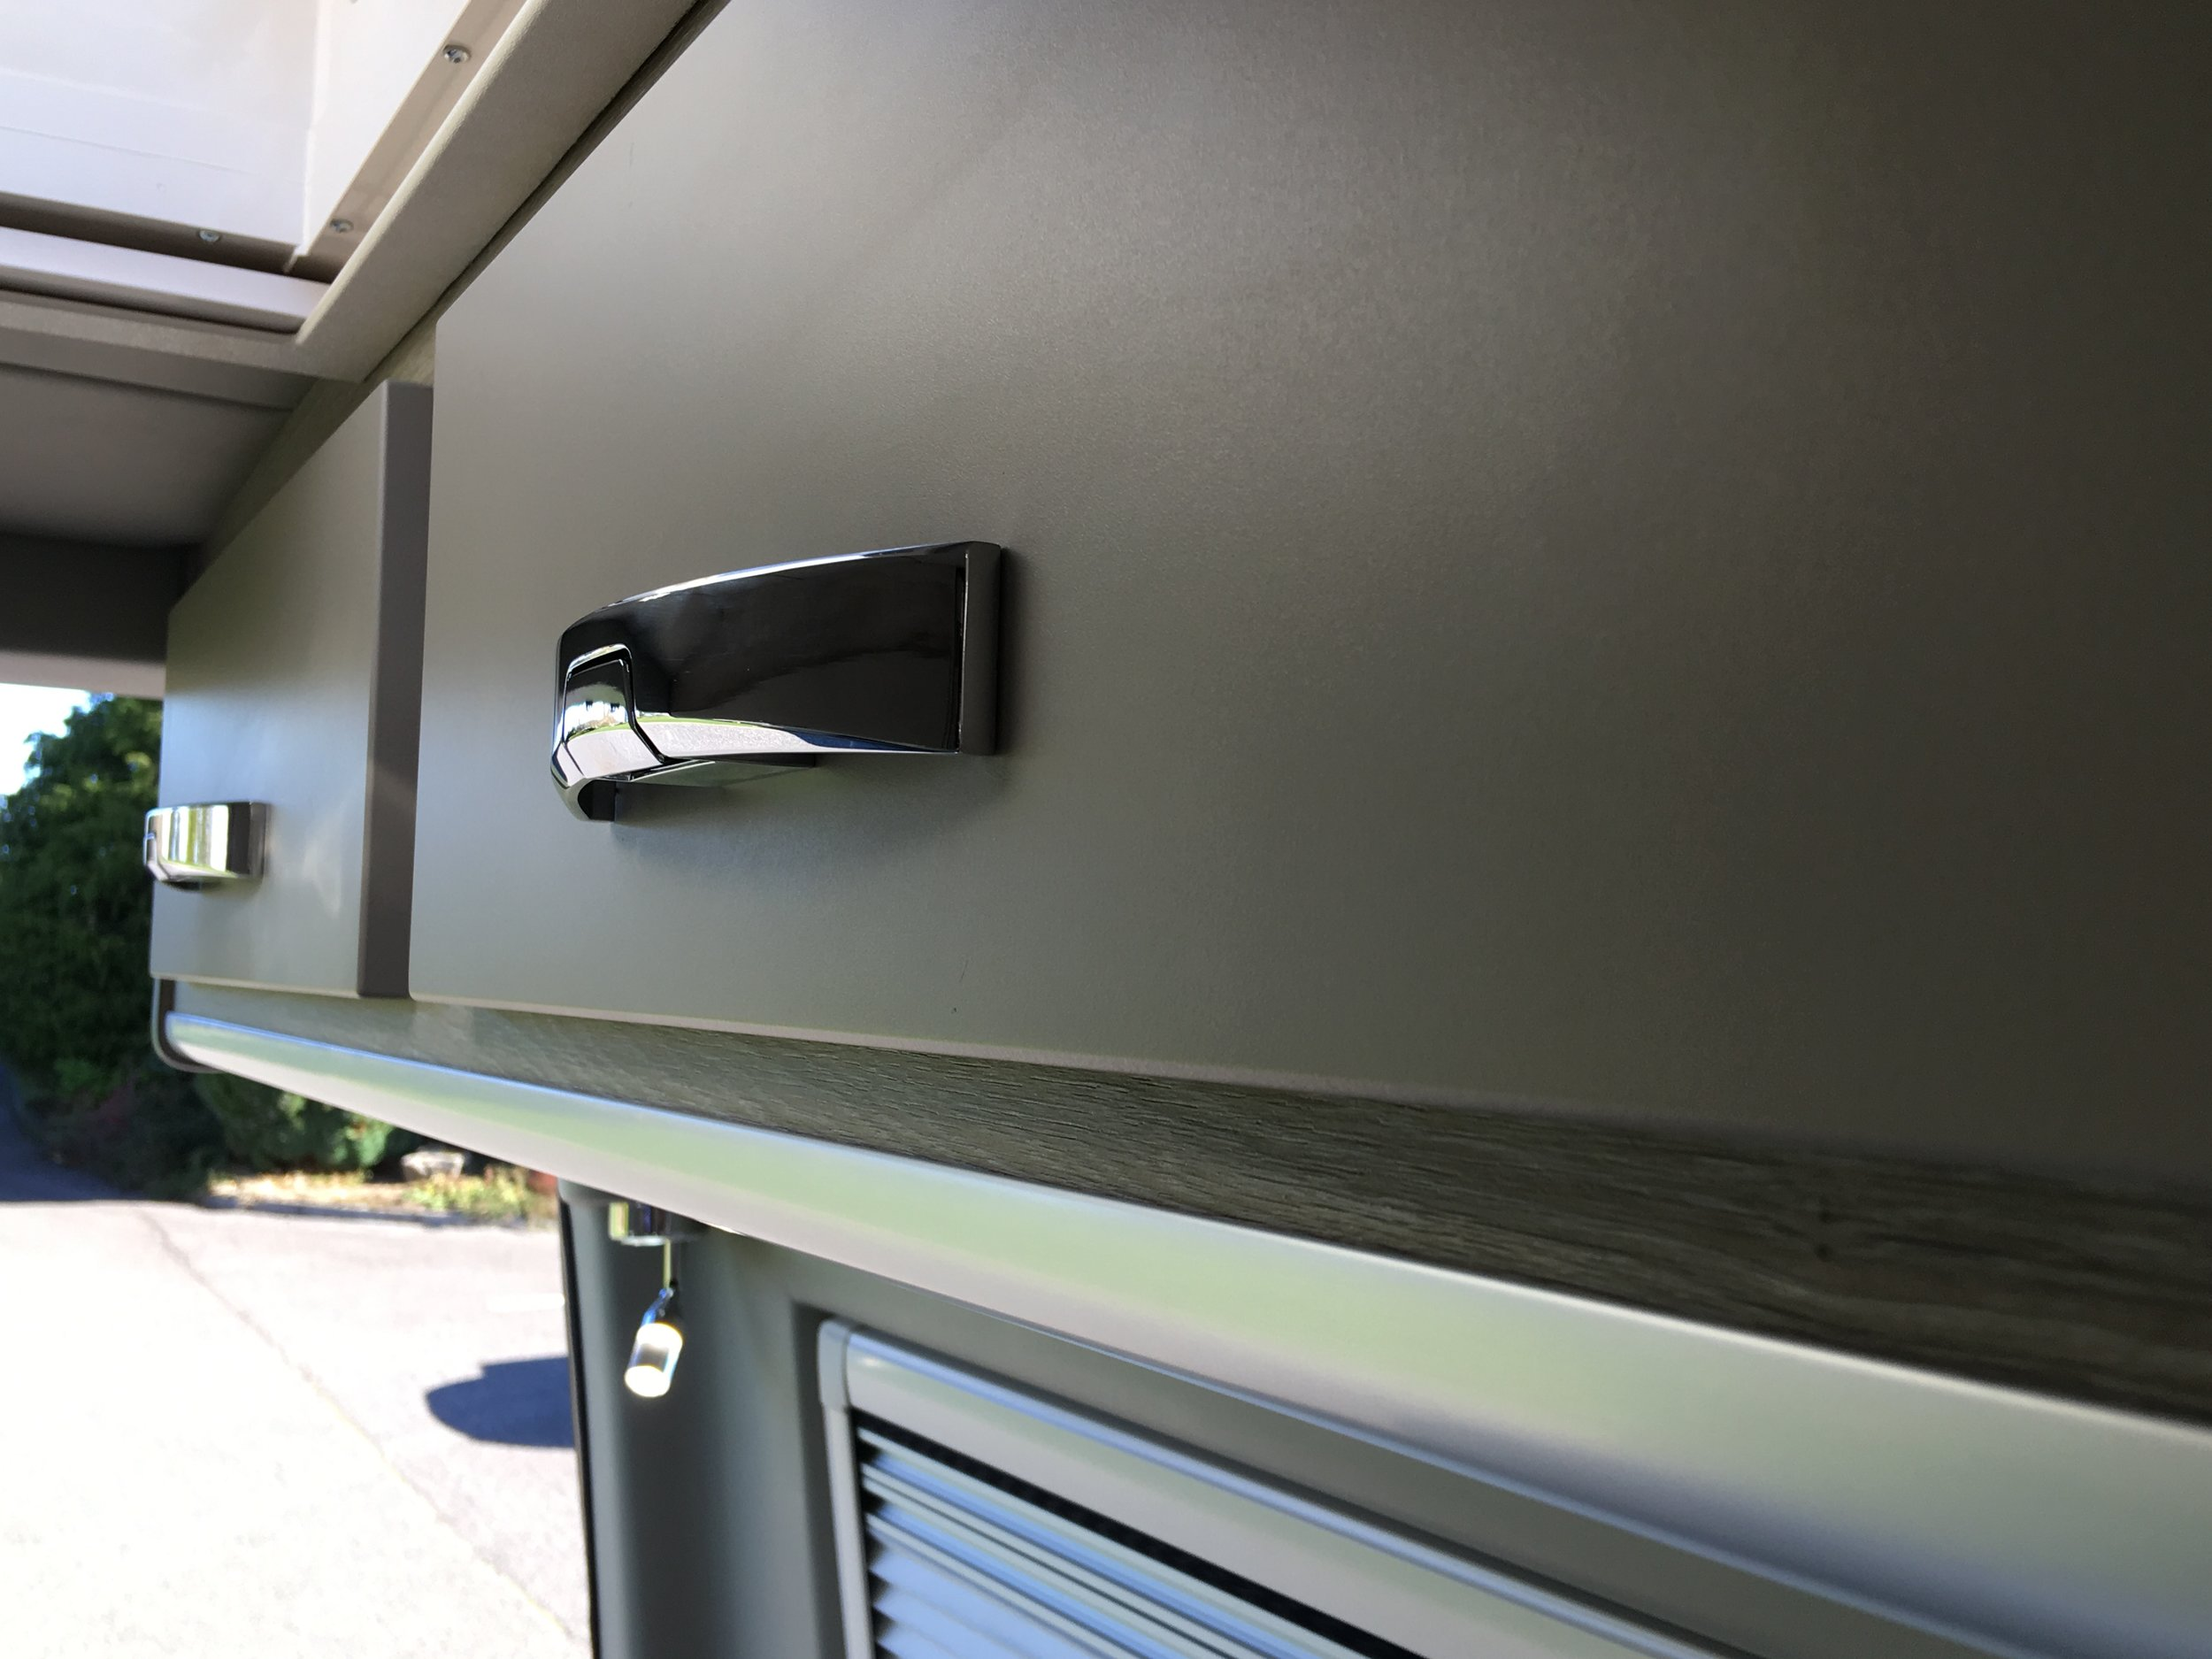 Overhead cupboard detail